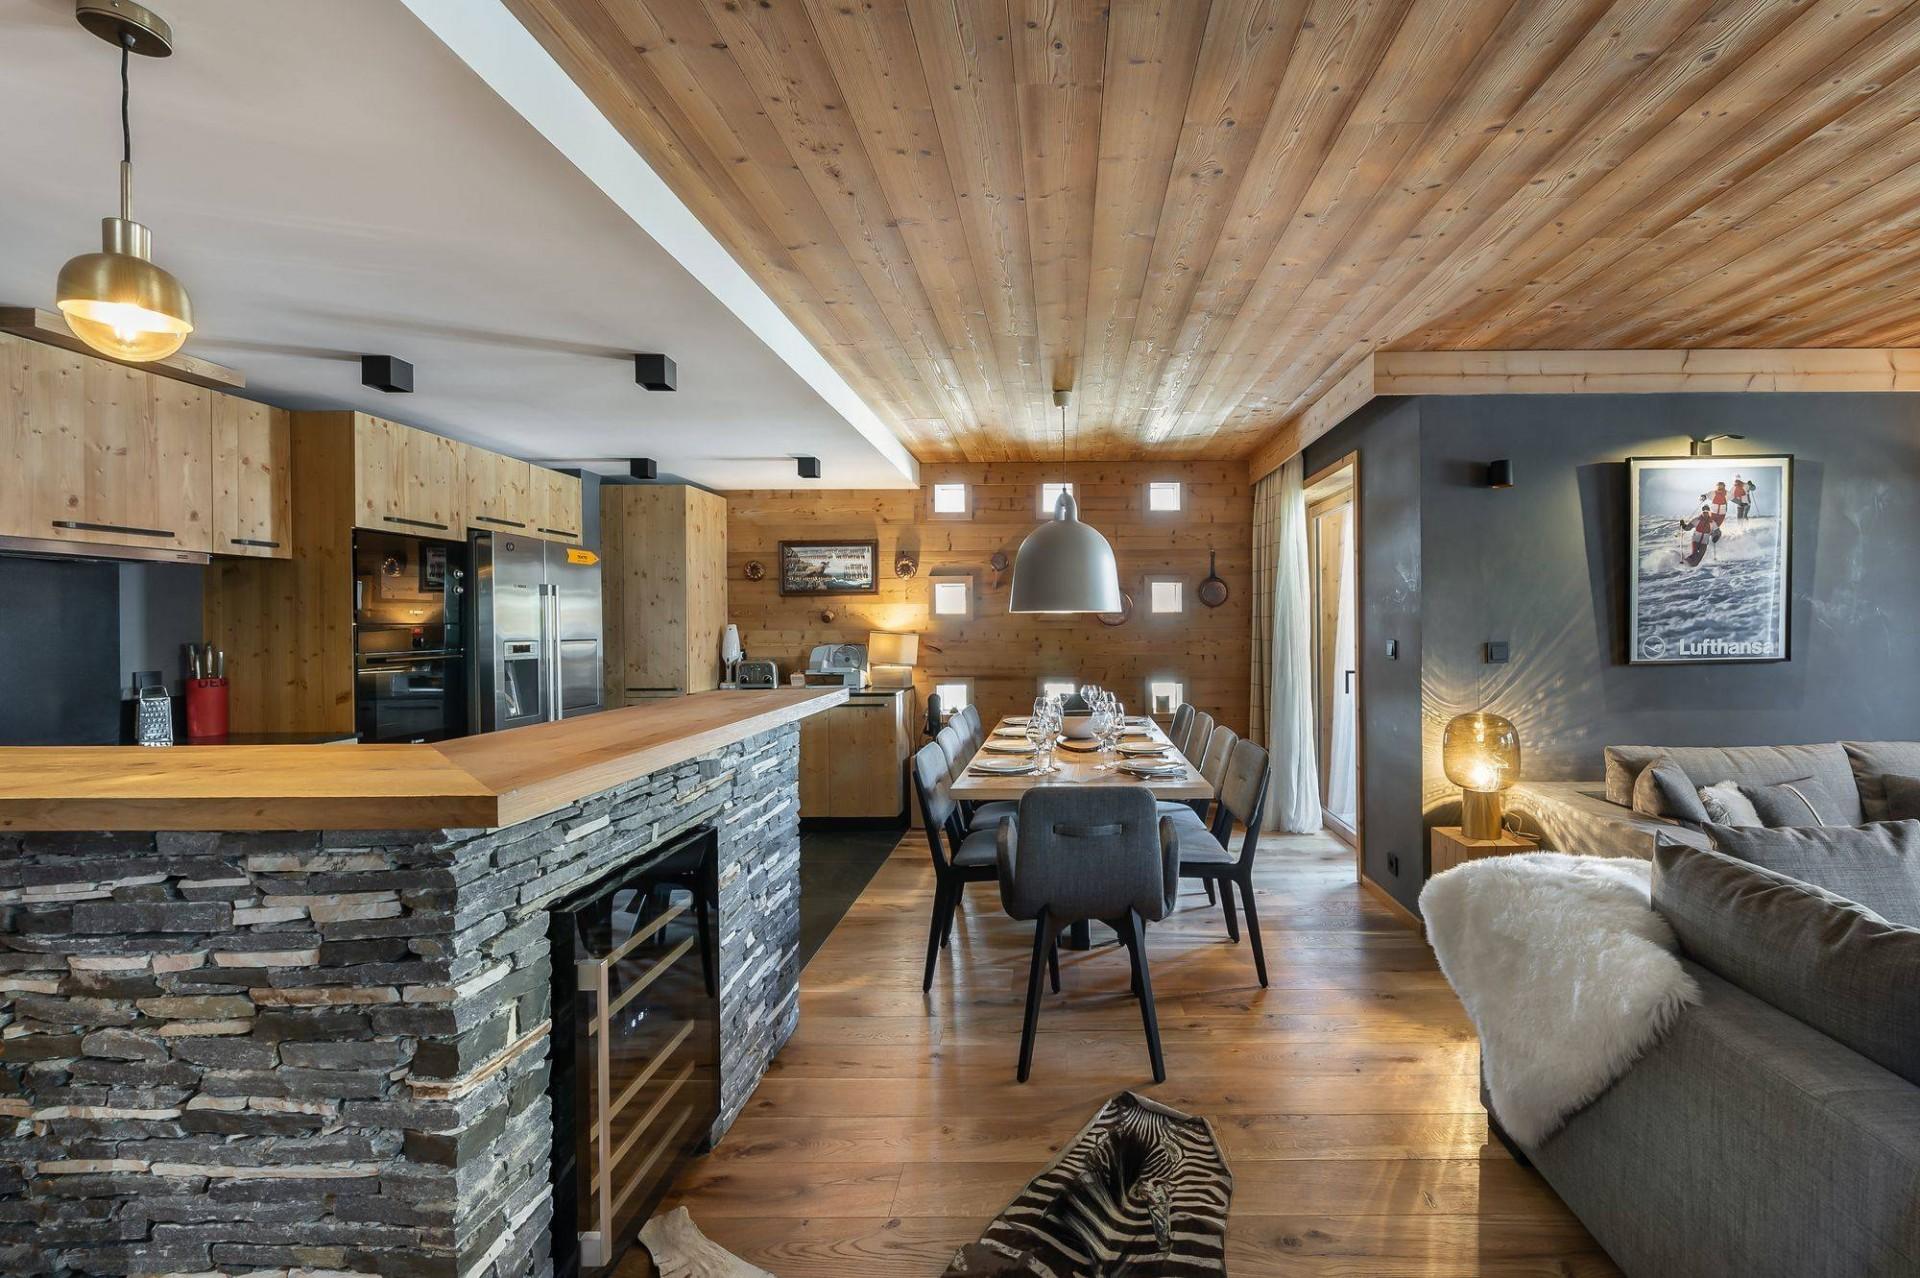 Val d'Isère Location Appartement Luxe Virlonte Salle A Manger